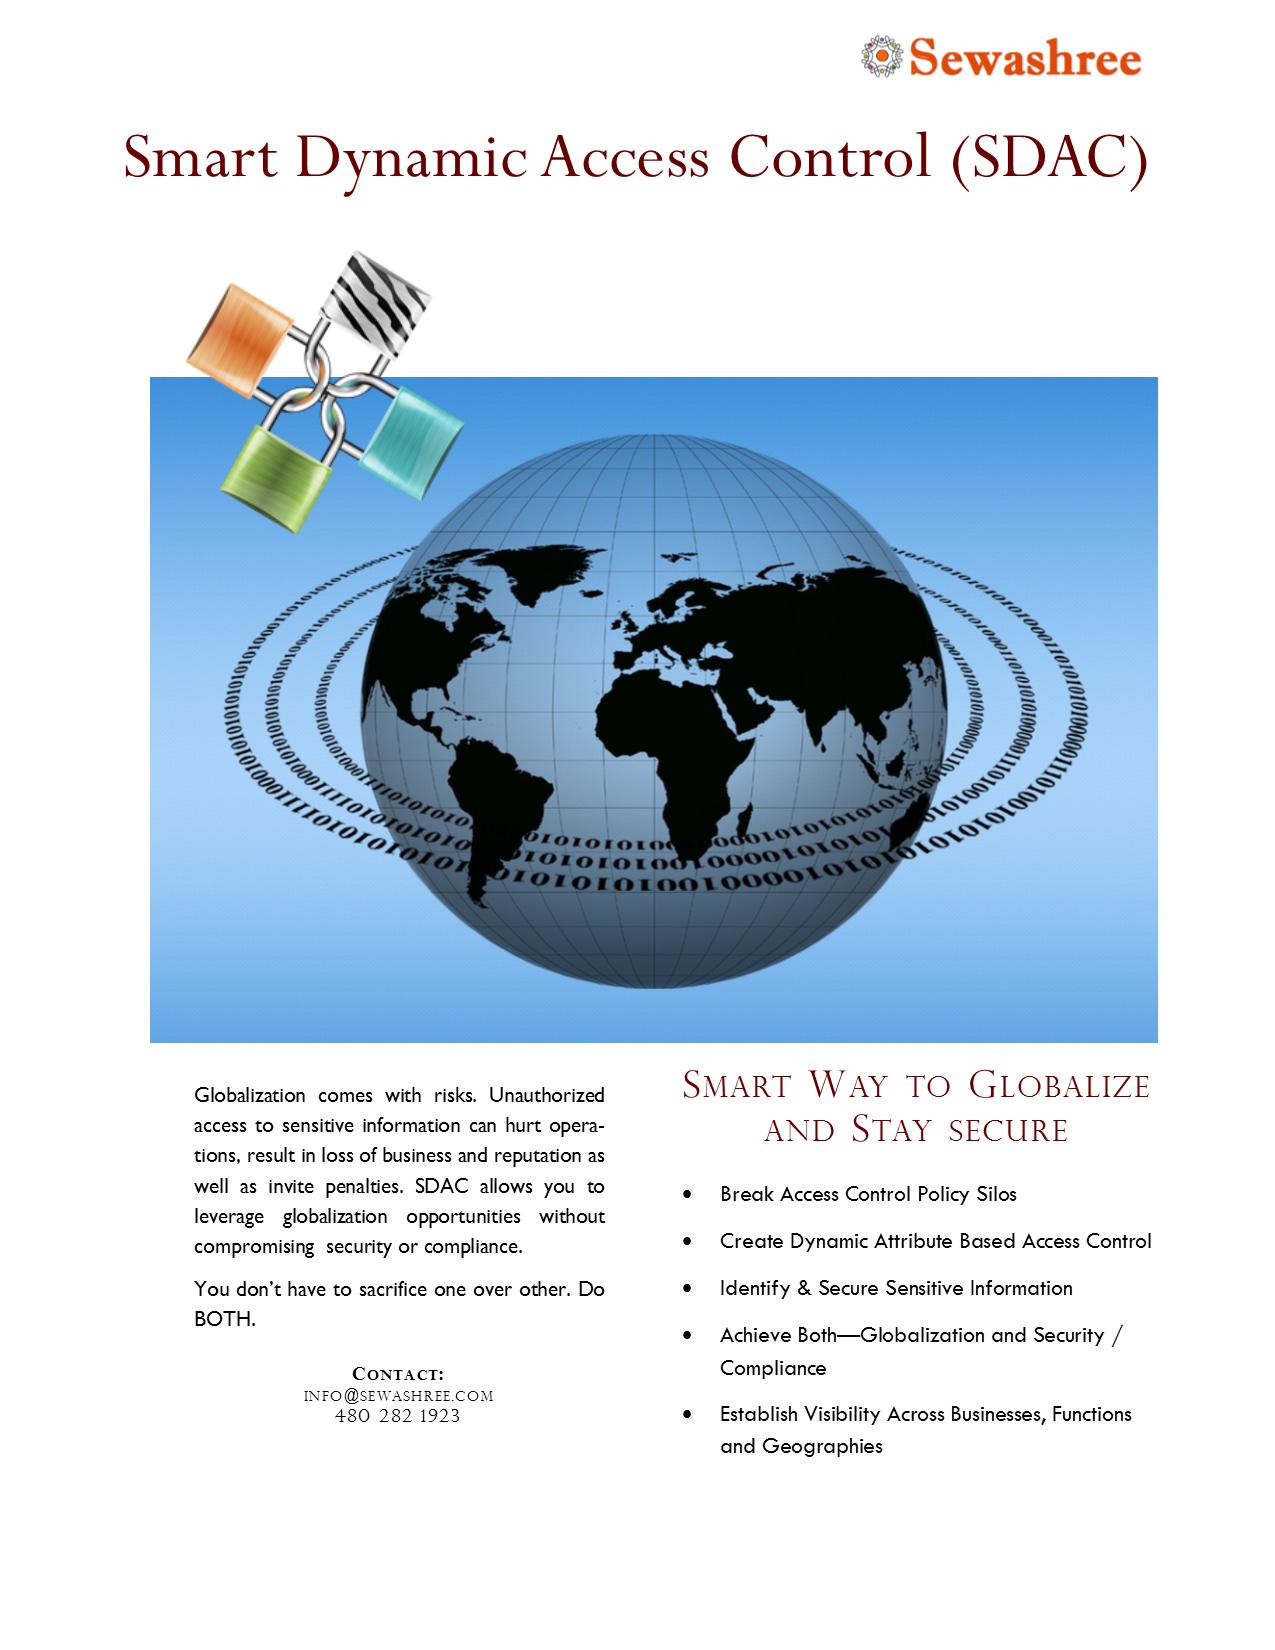 SDAC (Smart Dynamic Access Control)